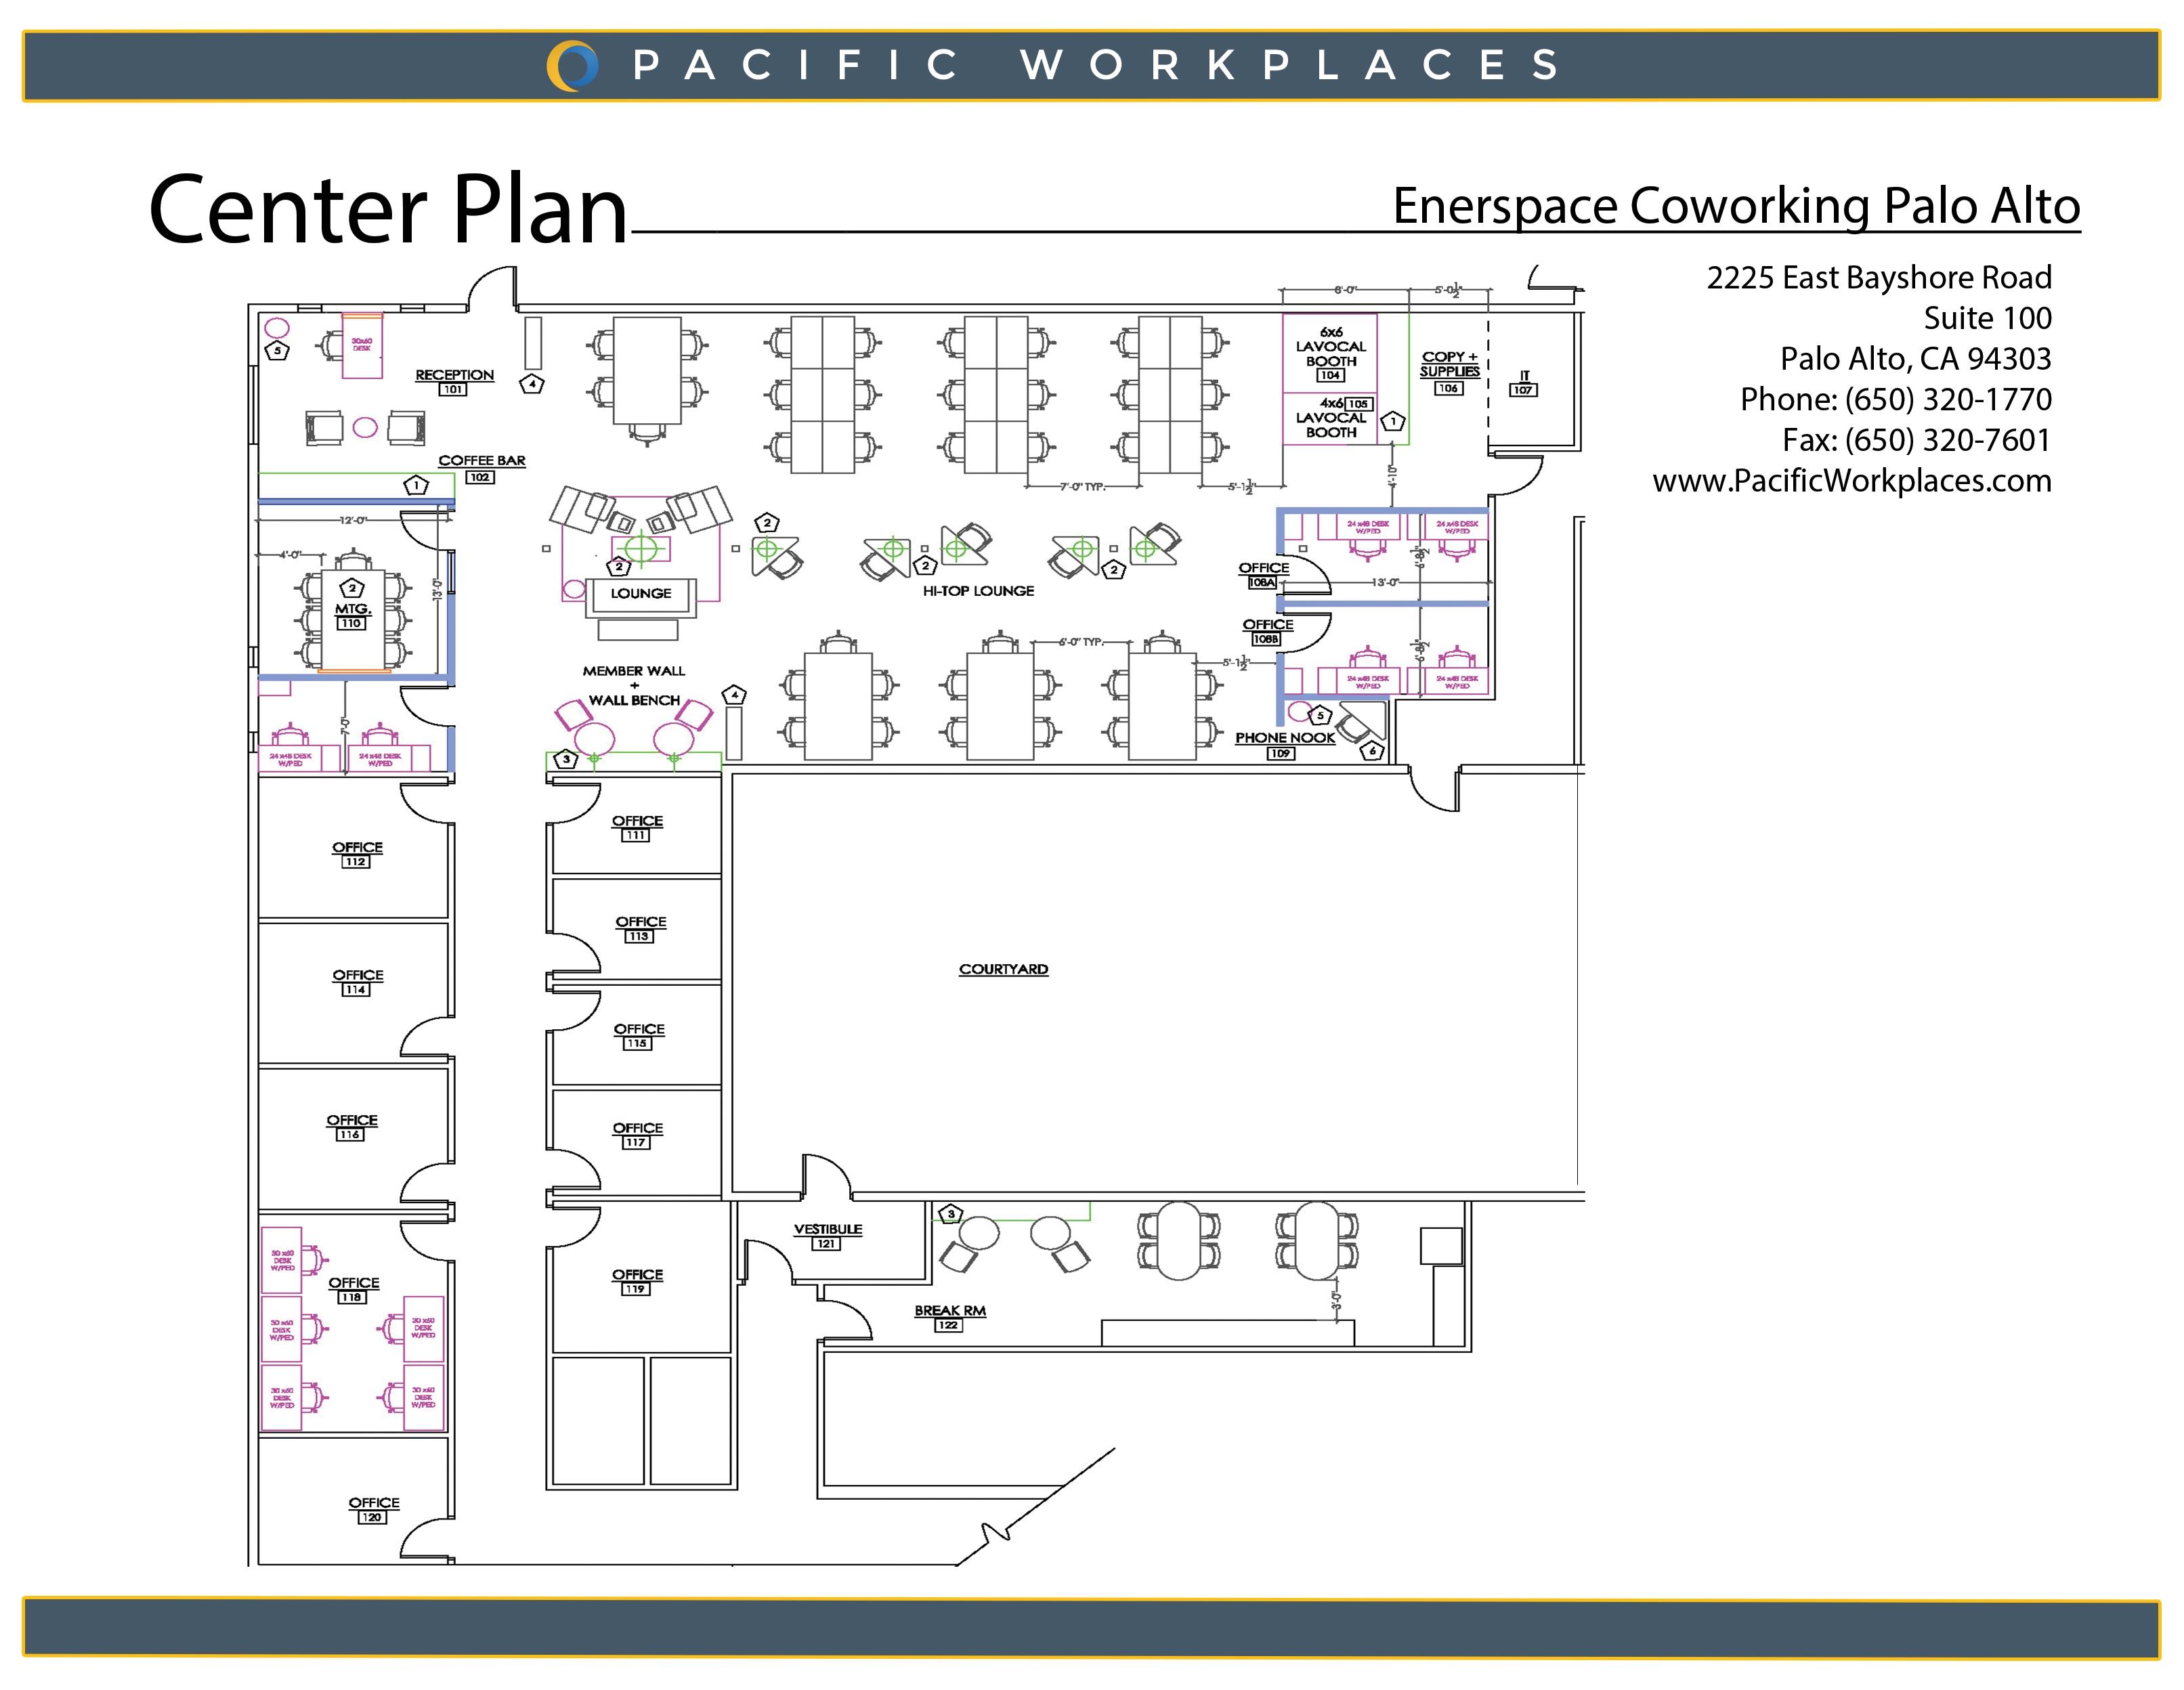 Enerspace Coworking Palo Alto Floor Plan 071618